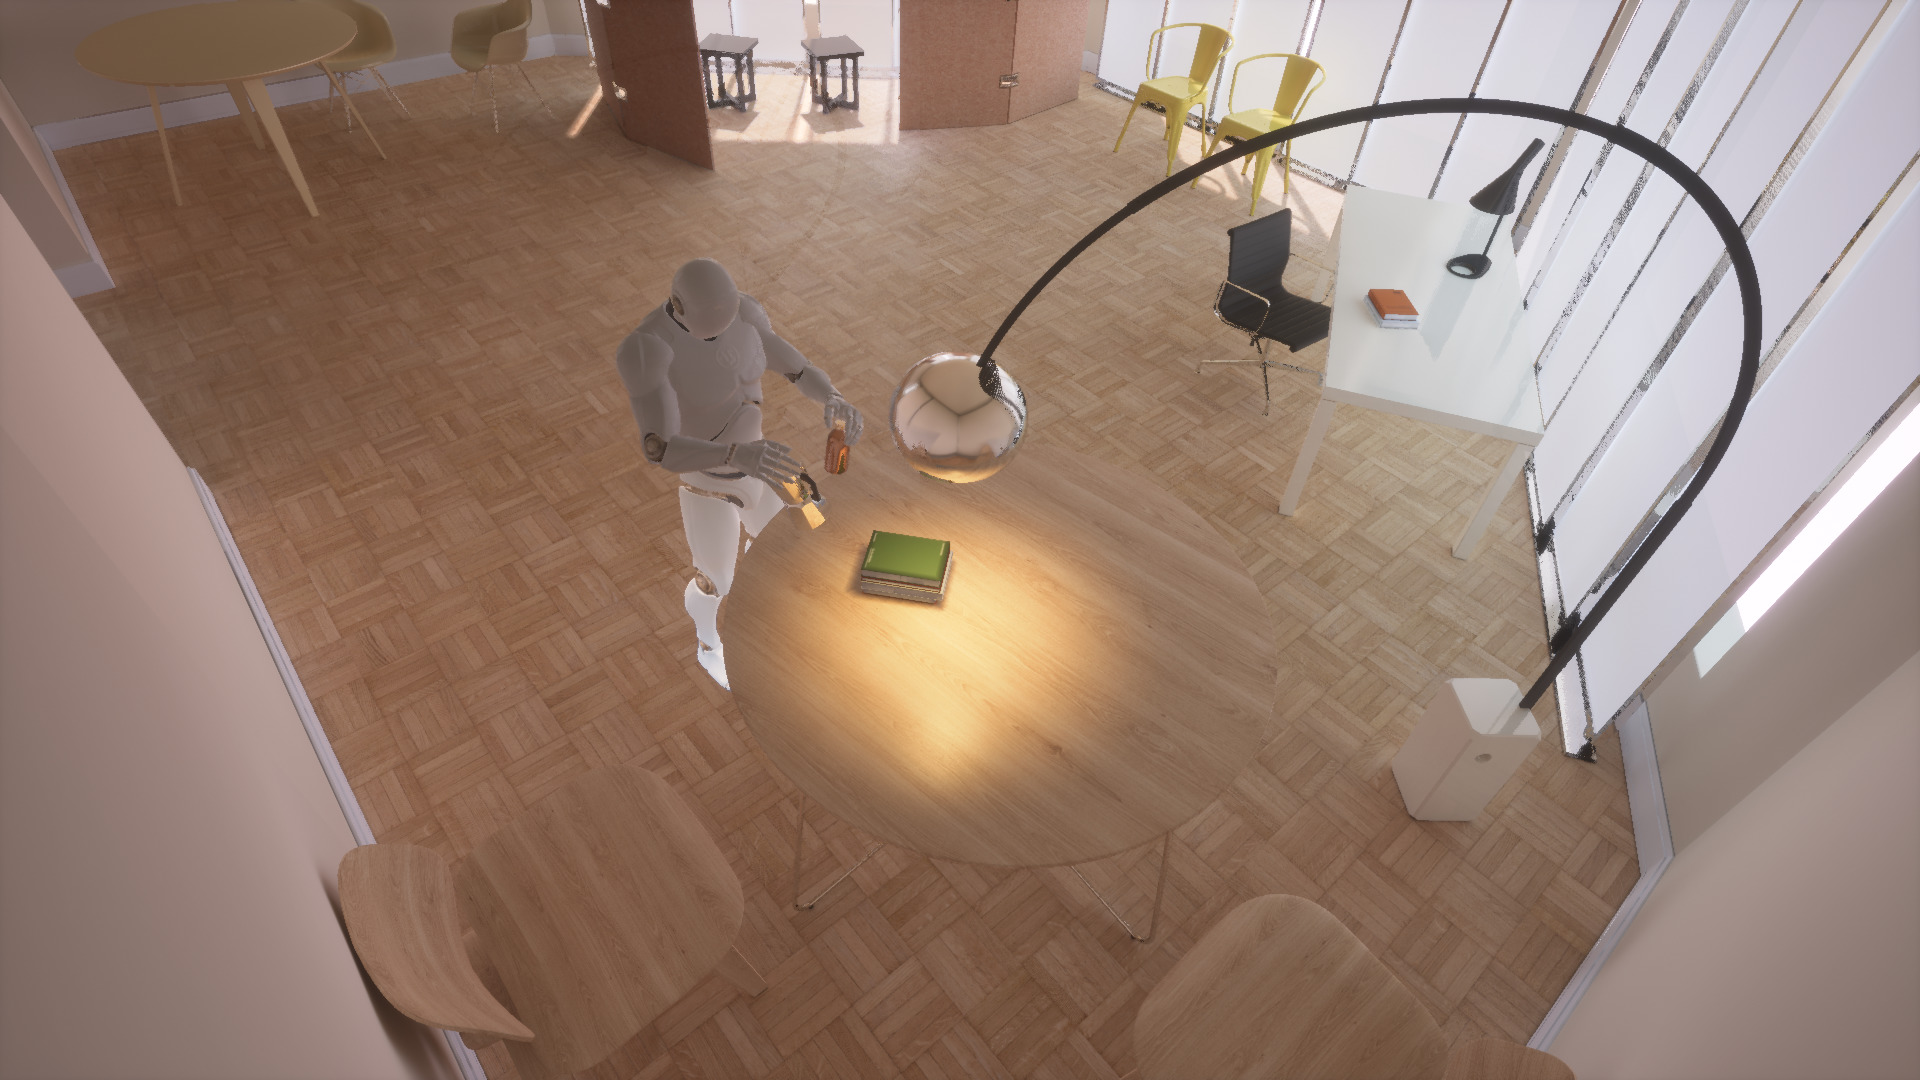 UnrealROX: A Photorealistic Virtual Reality Environment for Robotics